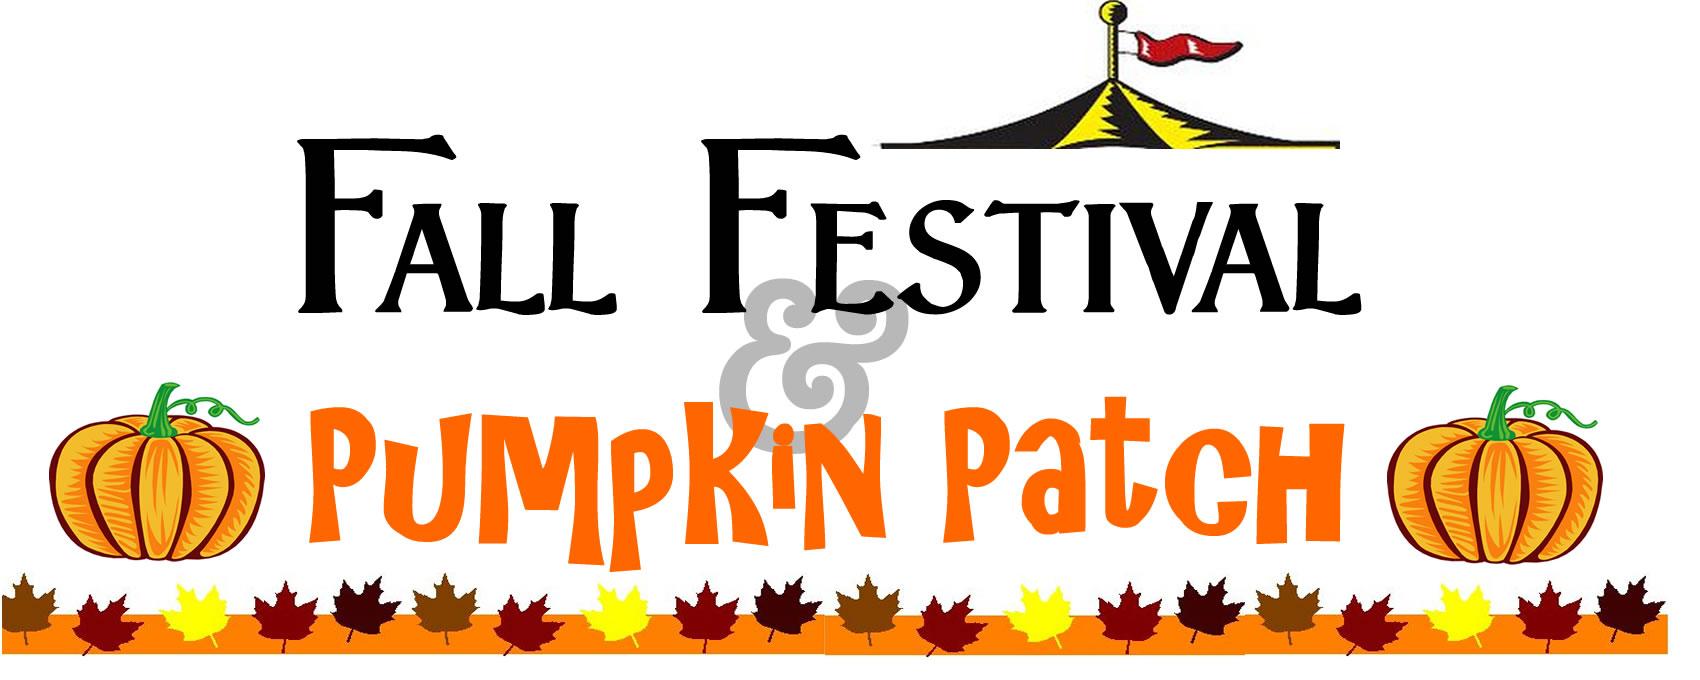 Fall festival clipart 3